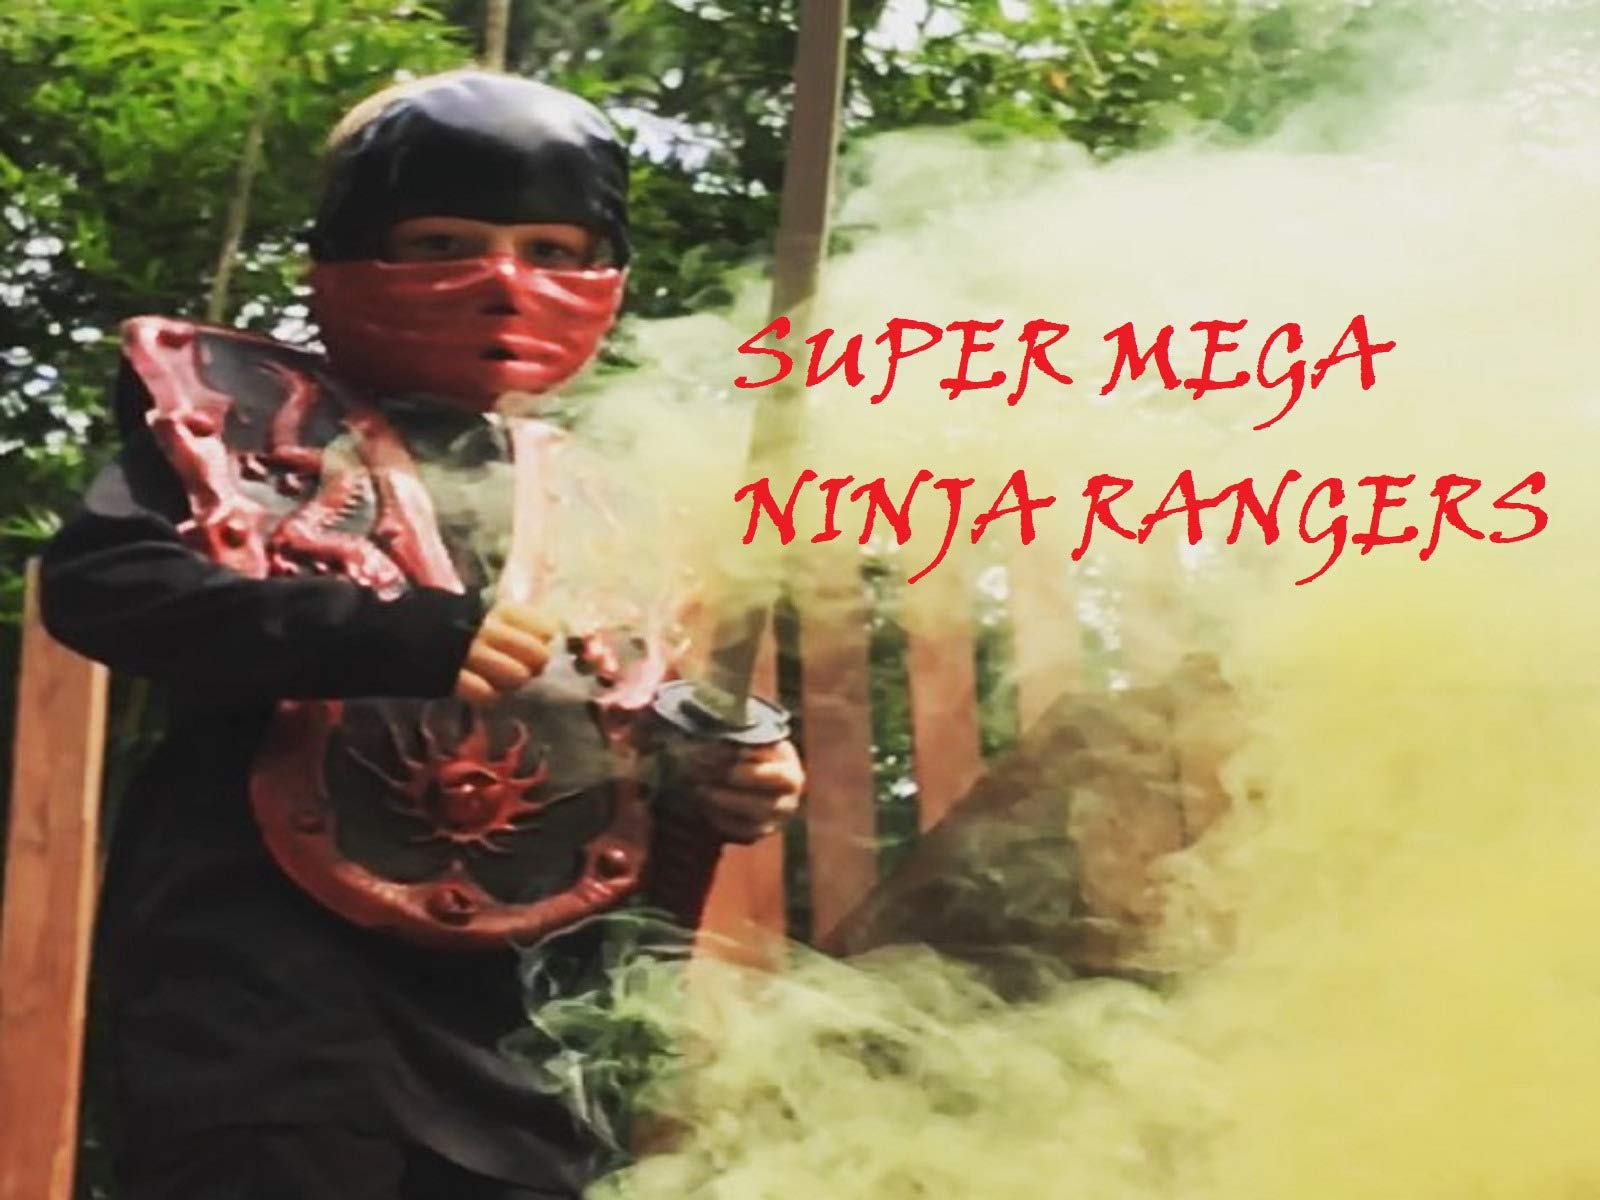 Clip: Super Mega Ninja Rangers on Amazon Prime Instant Video UK